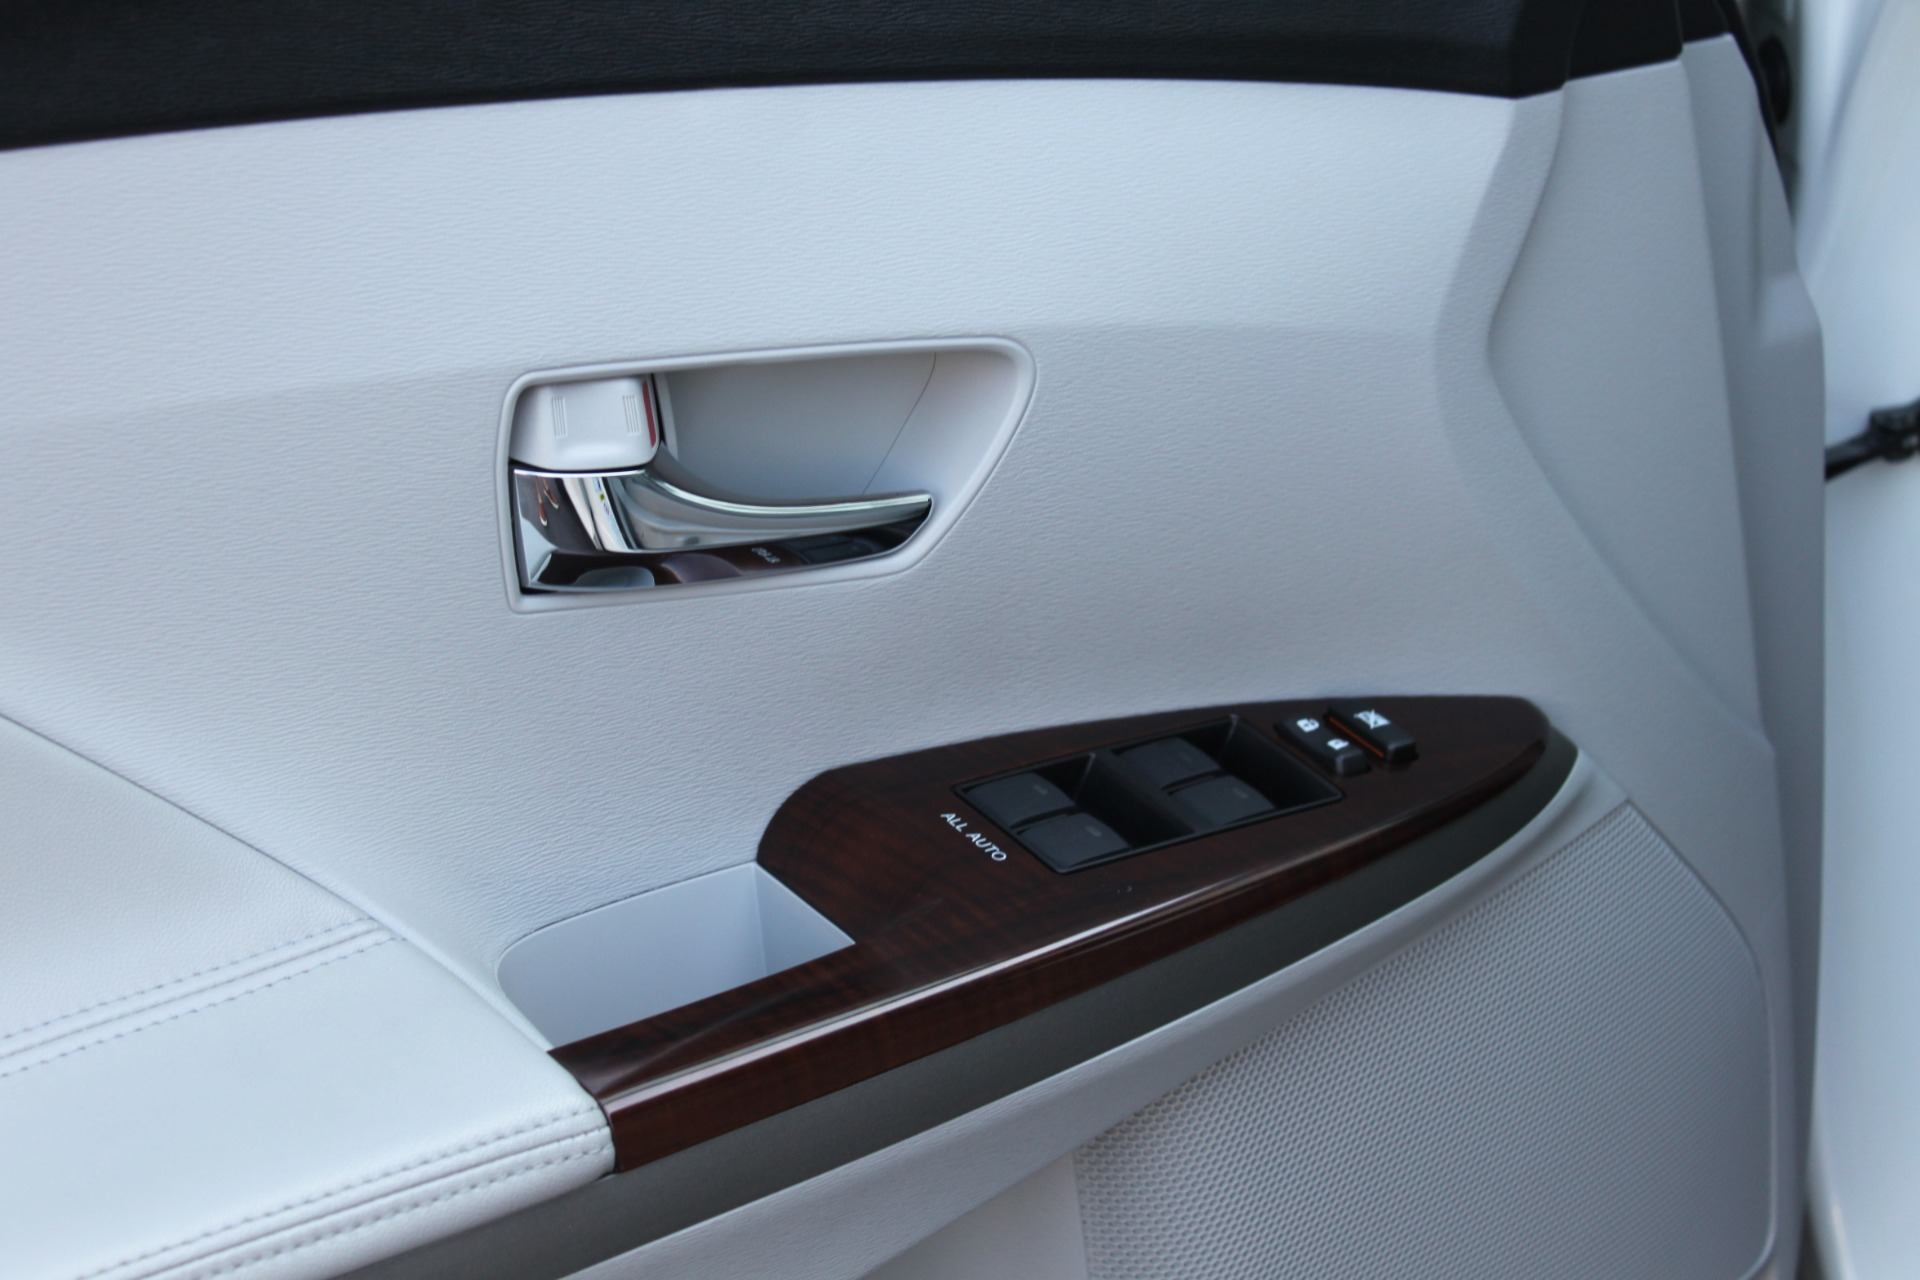 Used-2012-Toyota-Venza-XLE-Jaguar